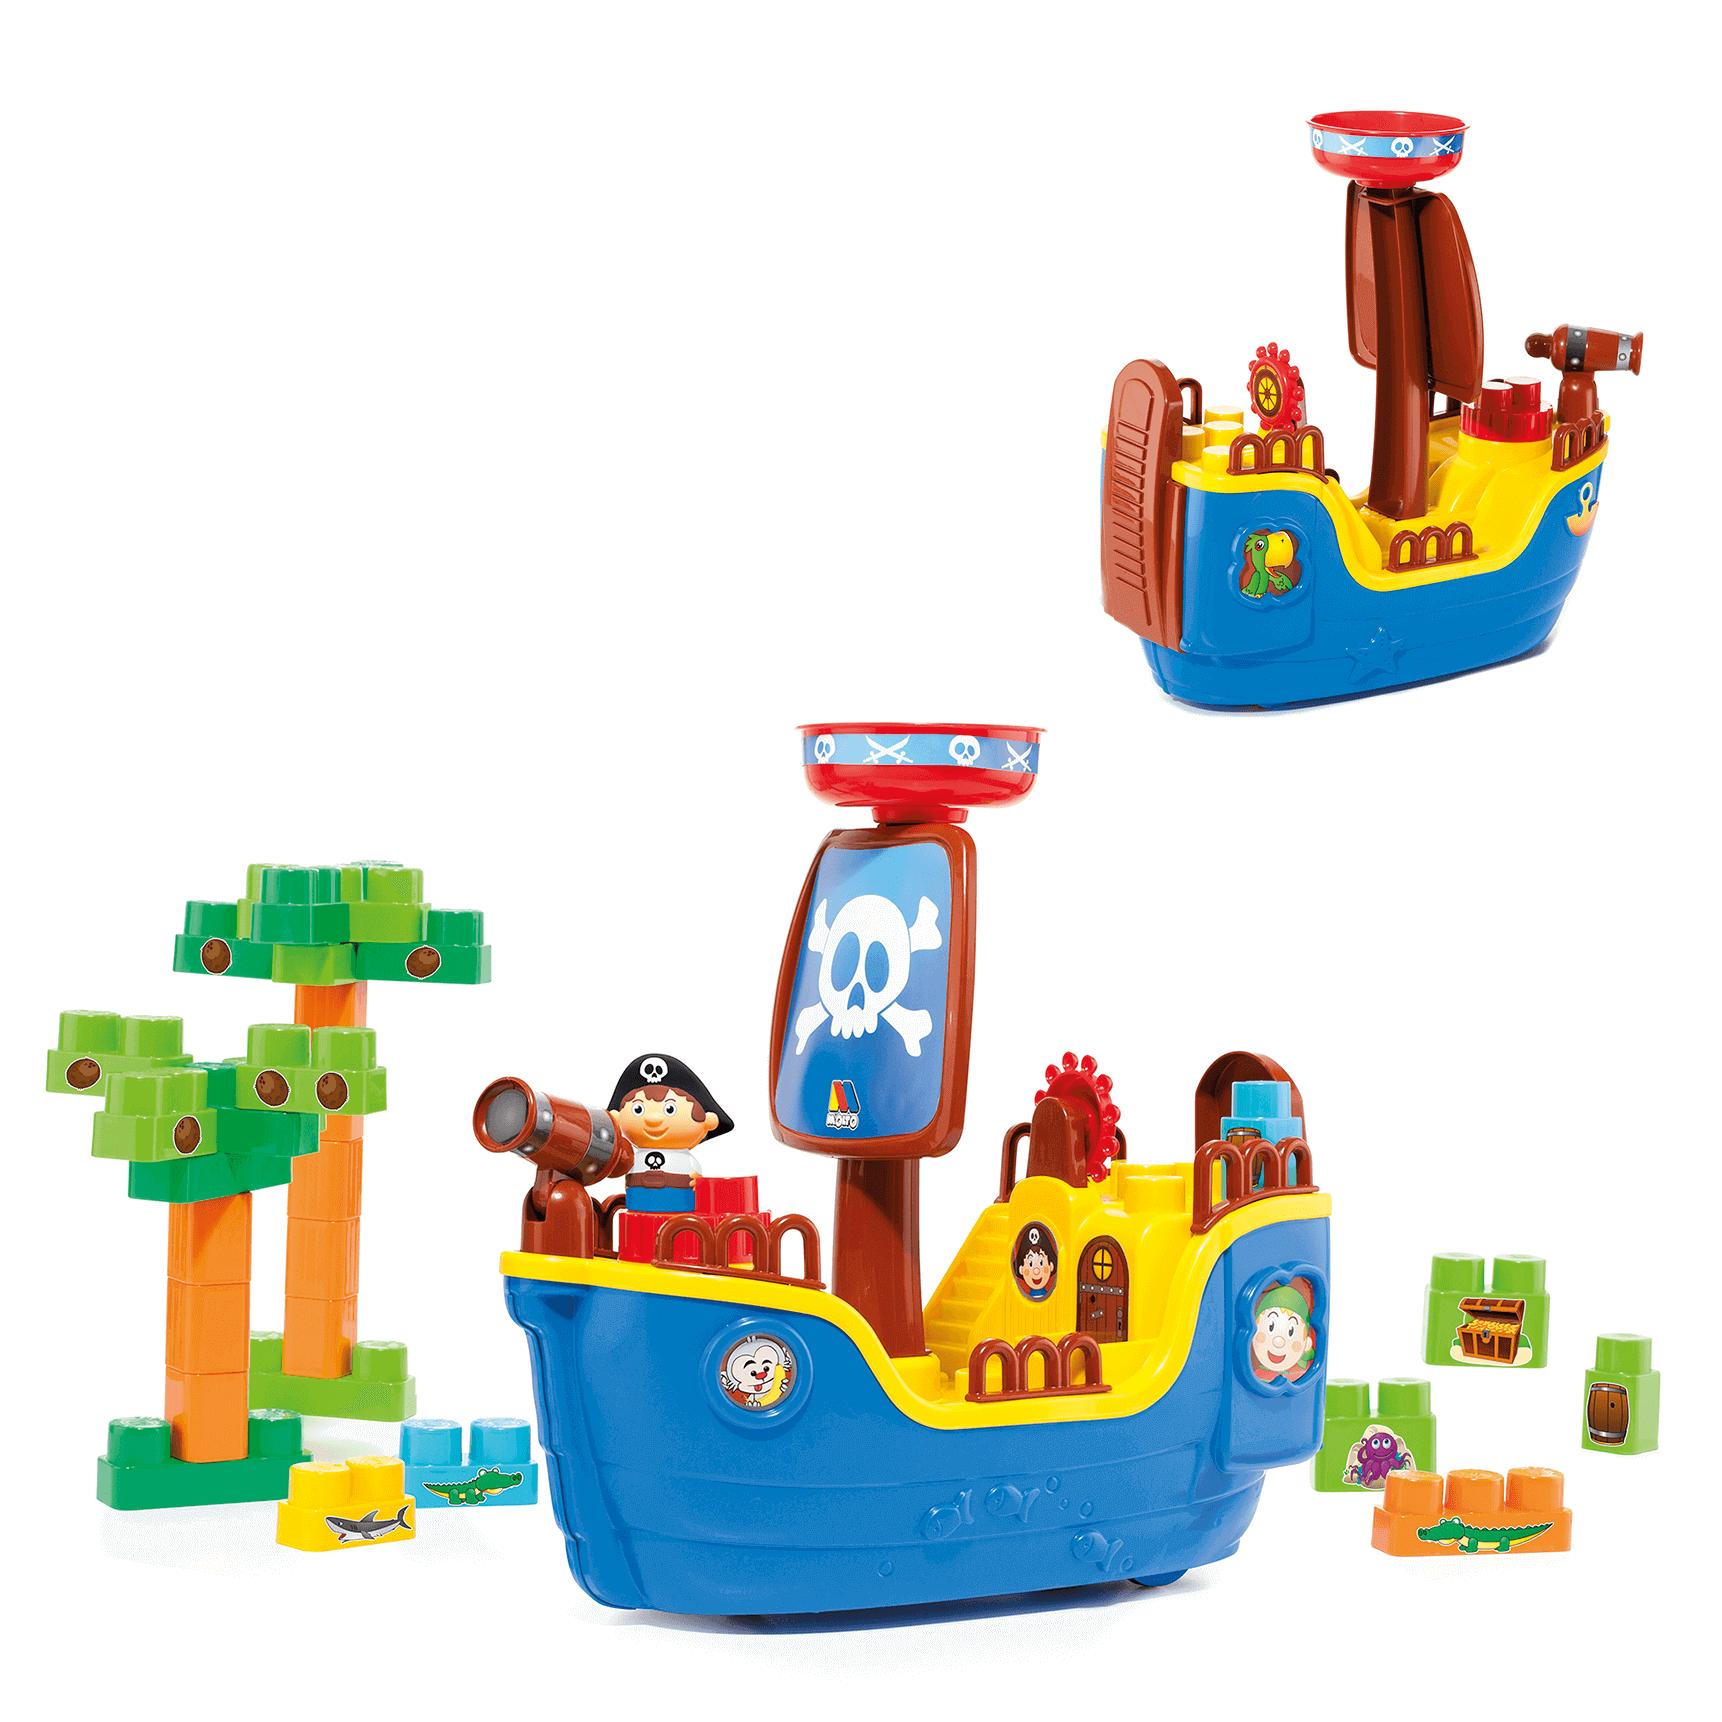 Blocos De Montar Baby Land Navio Pirata Com 30 Blocos 8002 Cardoso